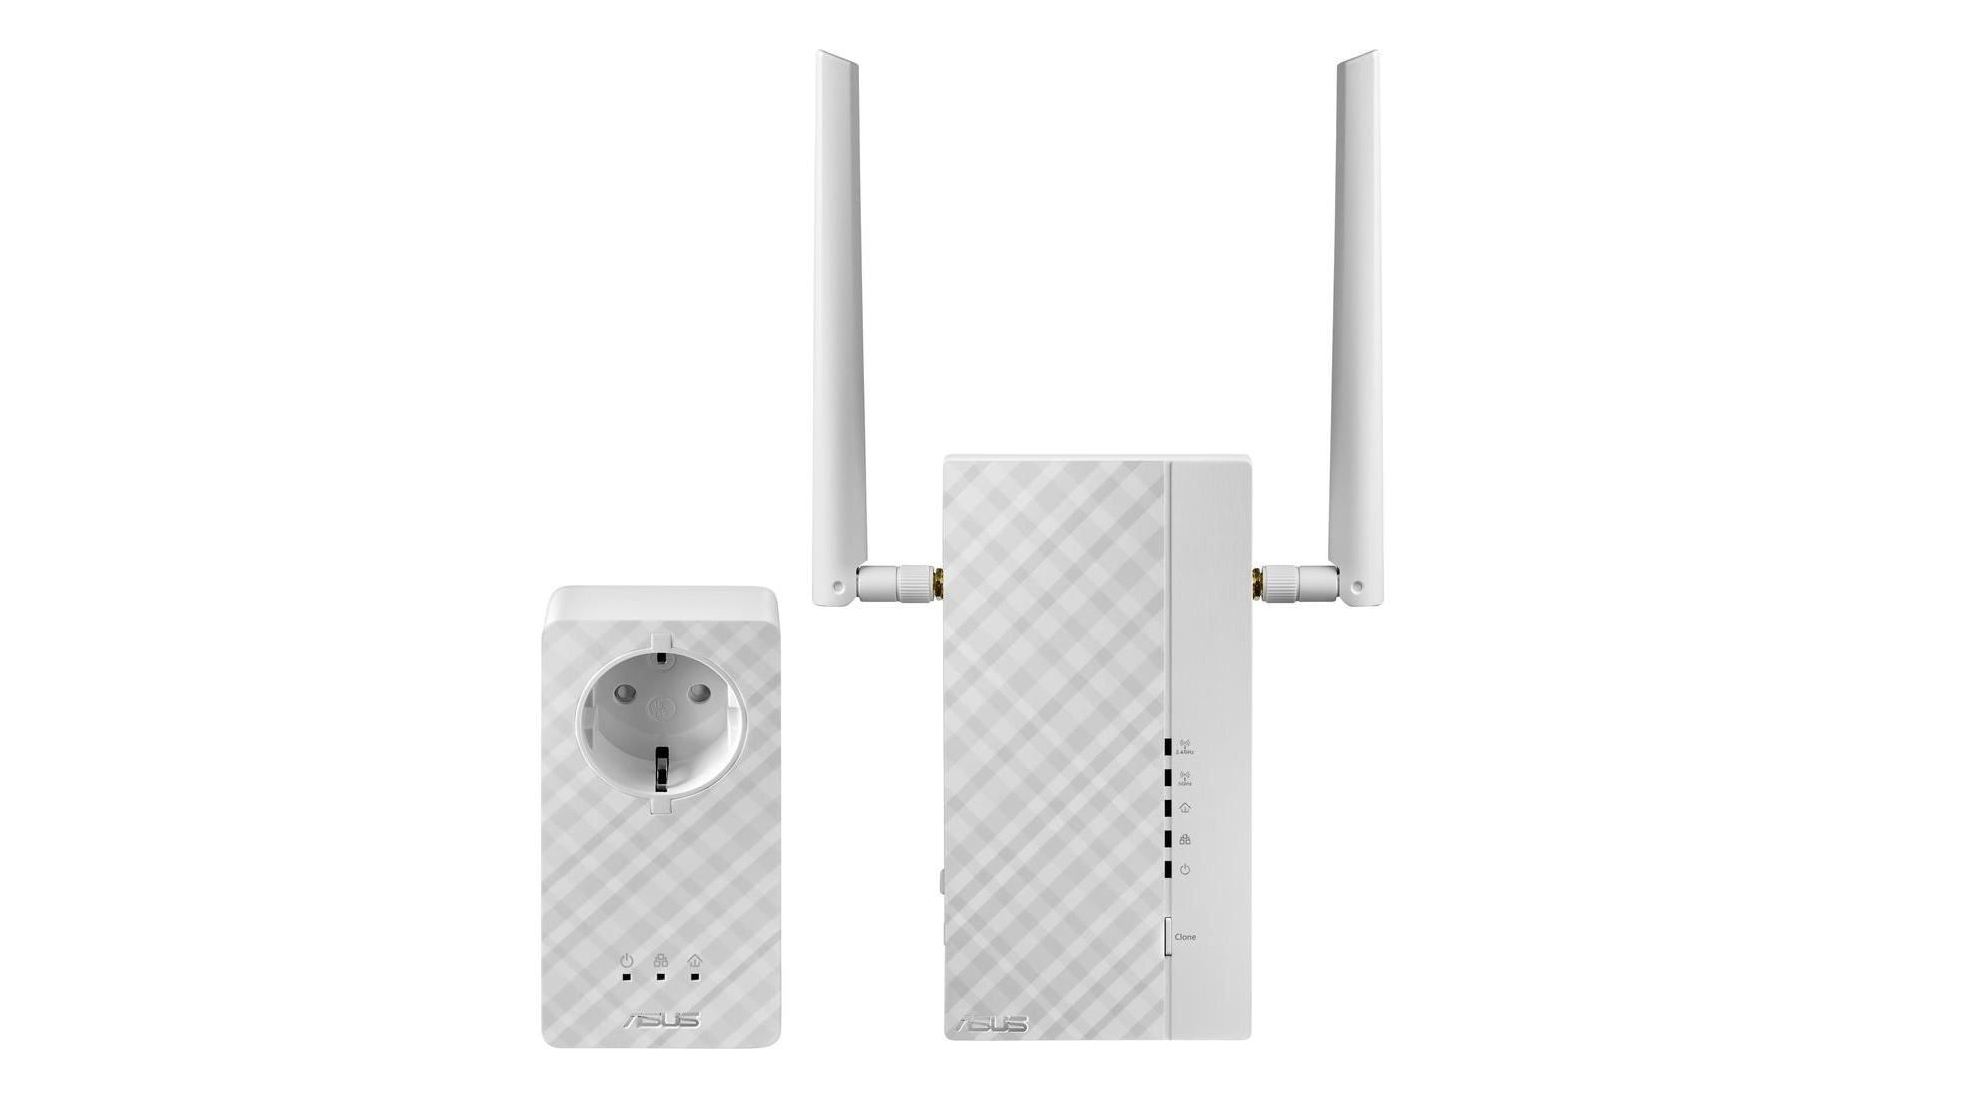 Asus 1200Mbps AV2 1200 Wifi Adaptateur Cpl